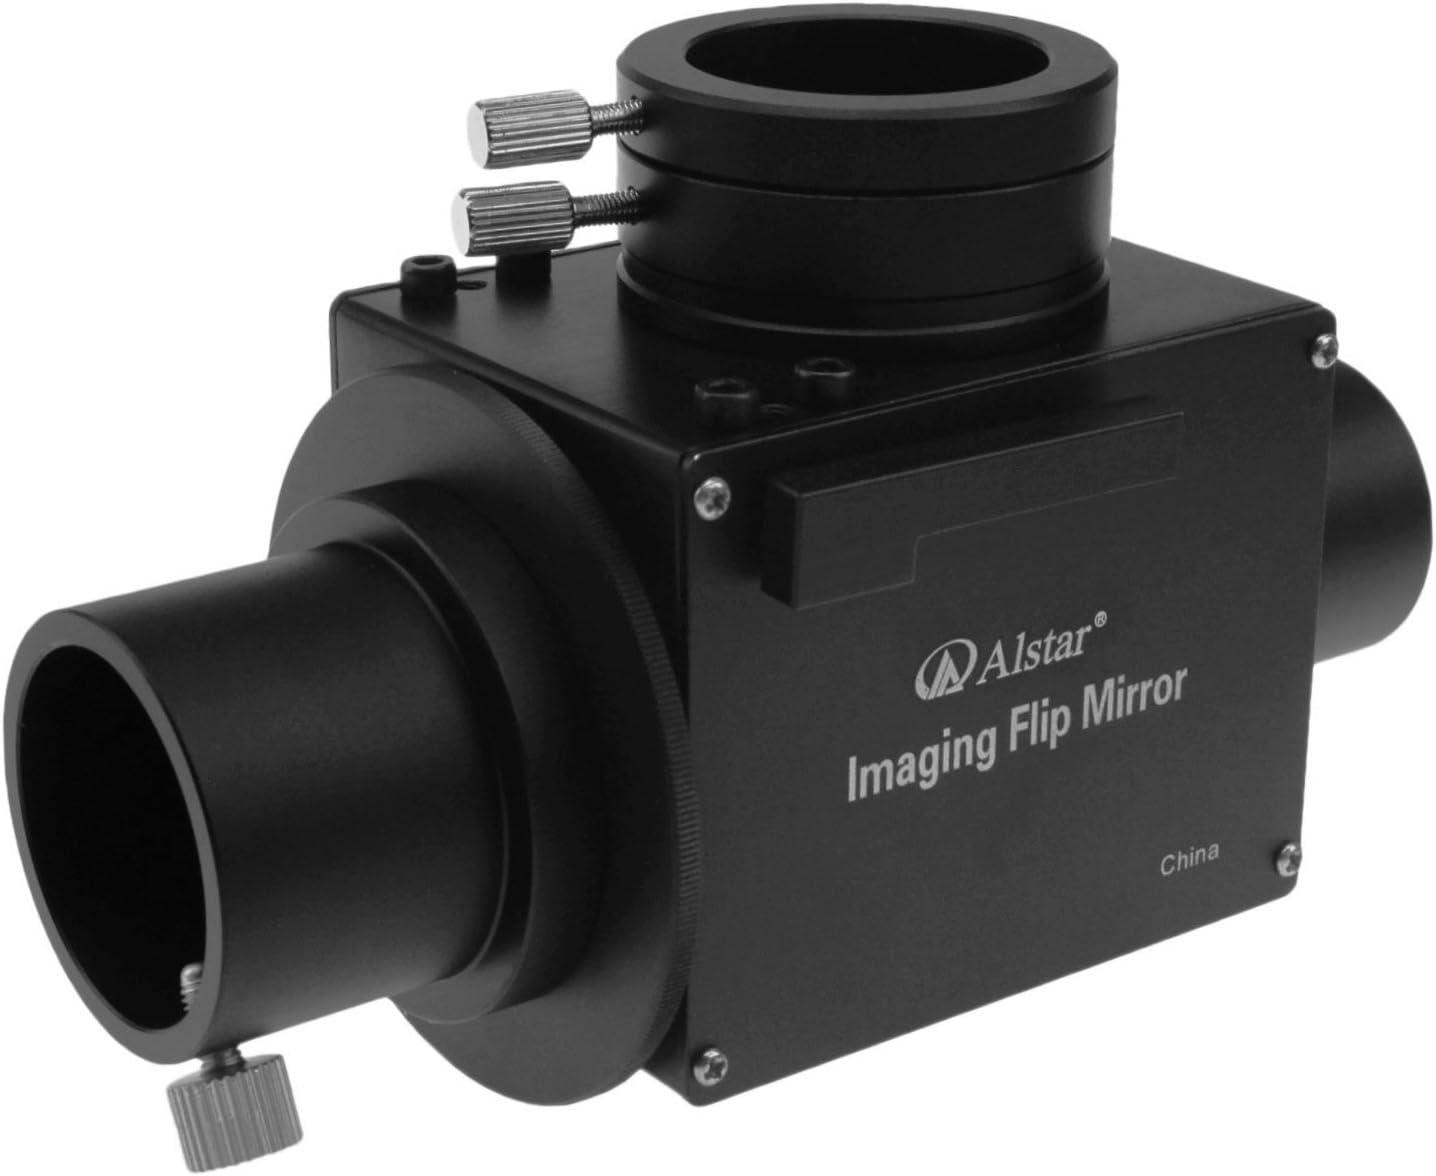 The flip Mirror for Precise Focusing Alstar 1.25 Astrophotography Flip Mirror with Eyepiece Adapter